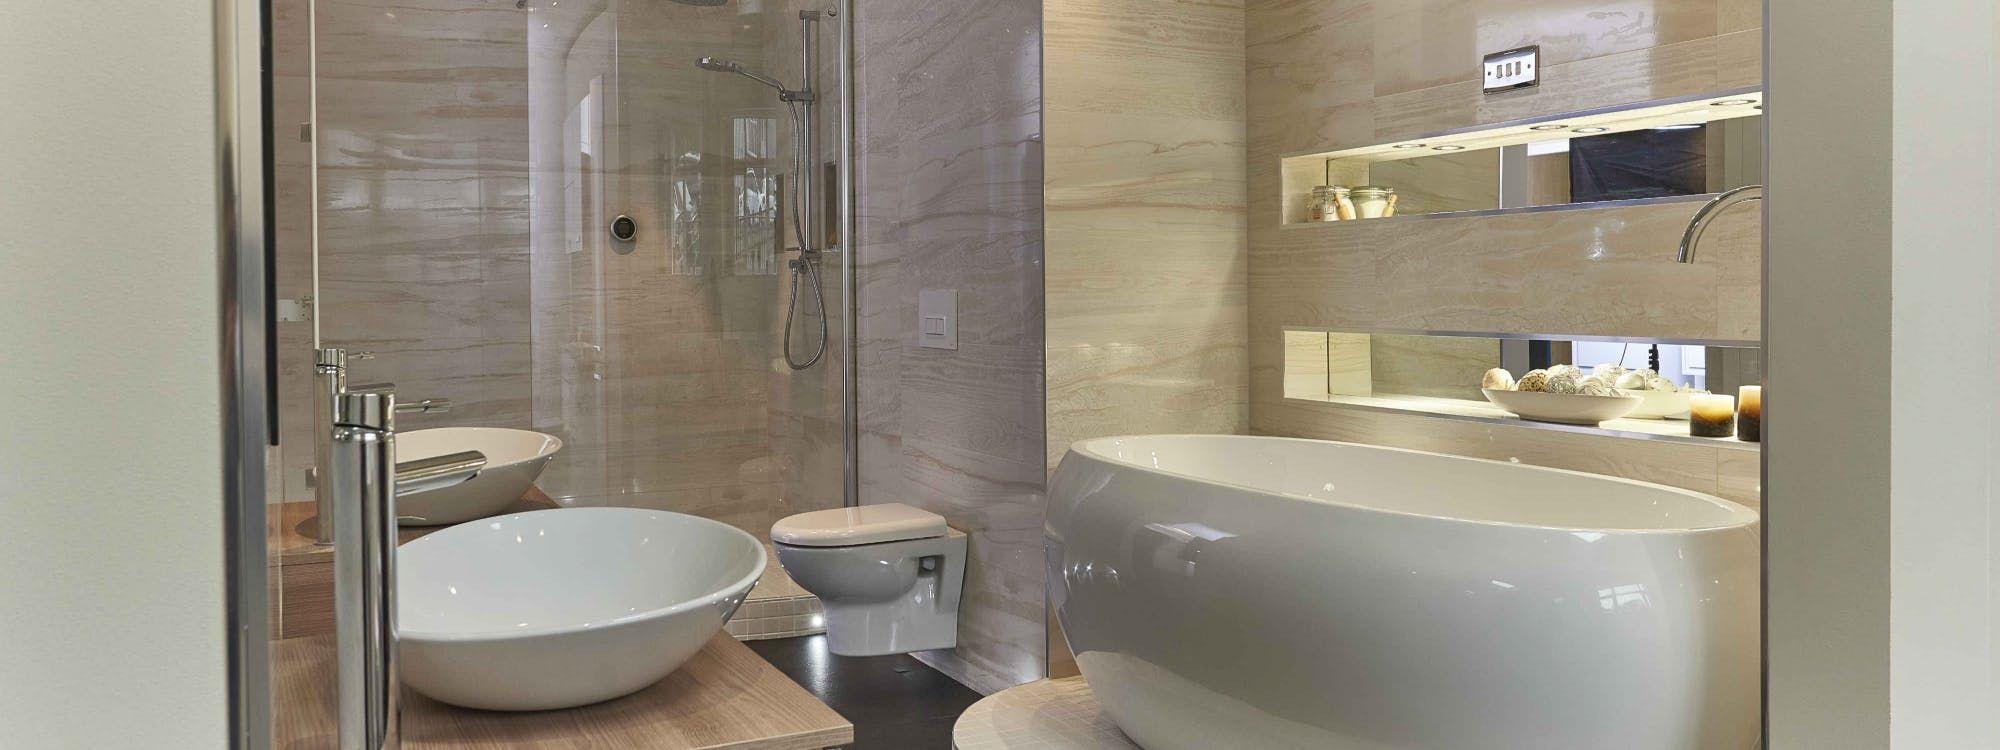 Bathroom Design West Yorkshire in 4  Bathroom design, Top